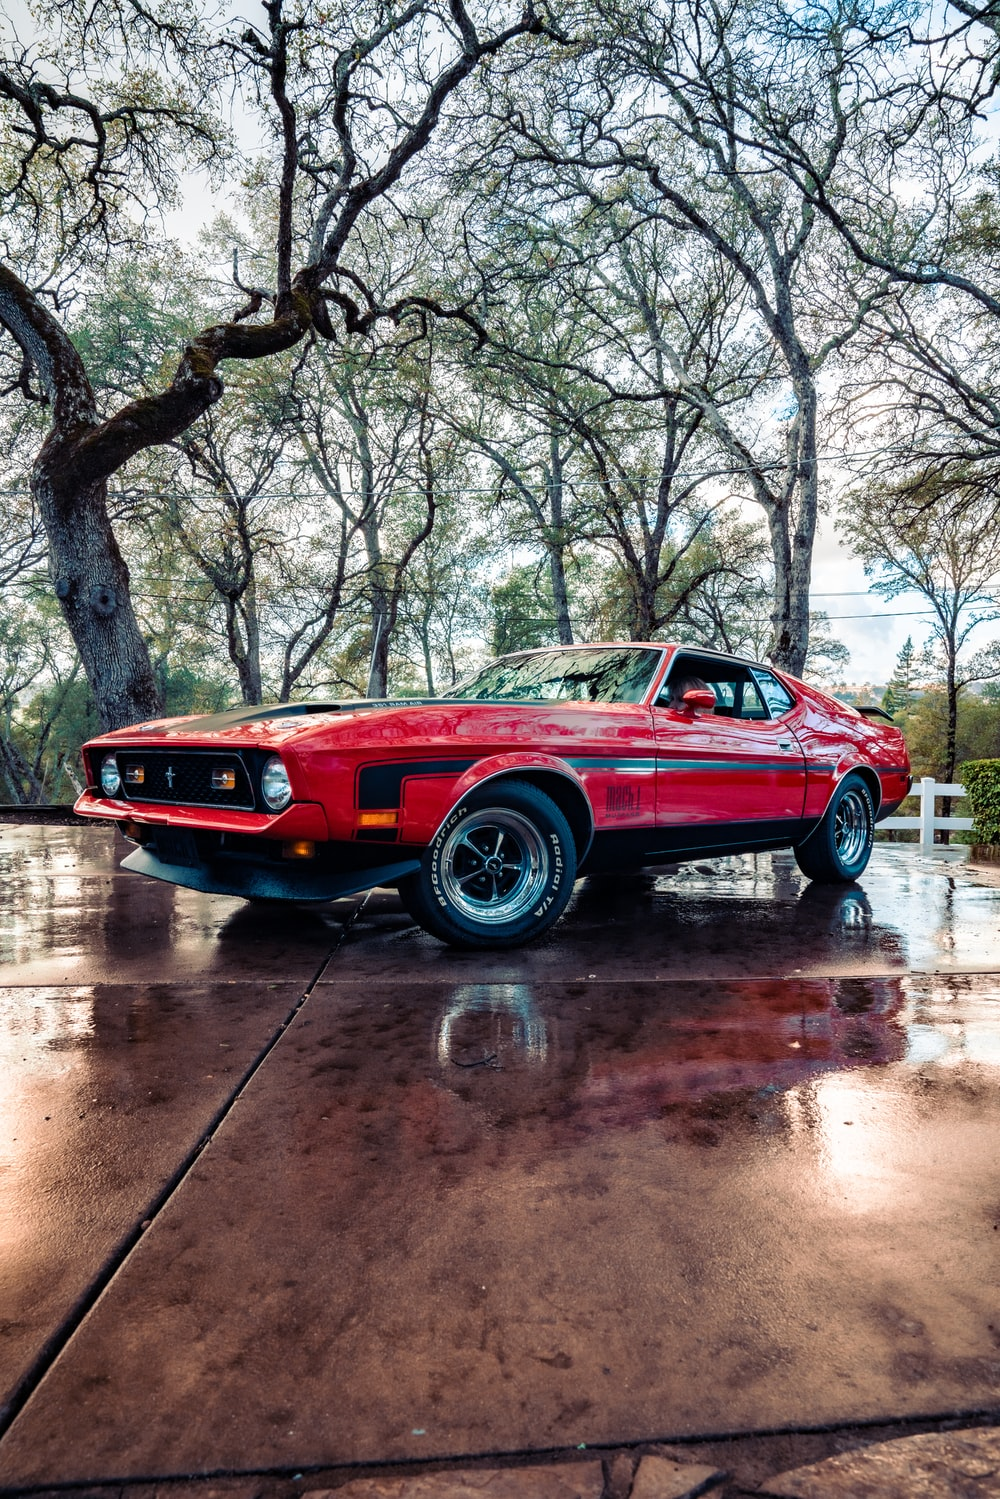 red chevrolet camaro on road